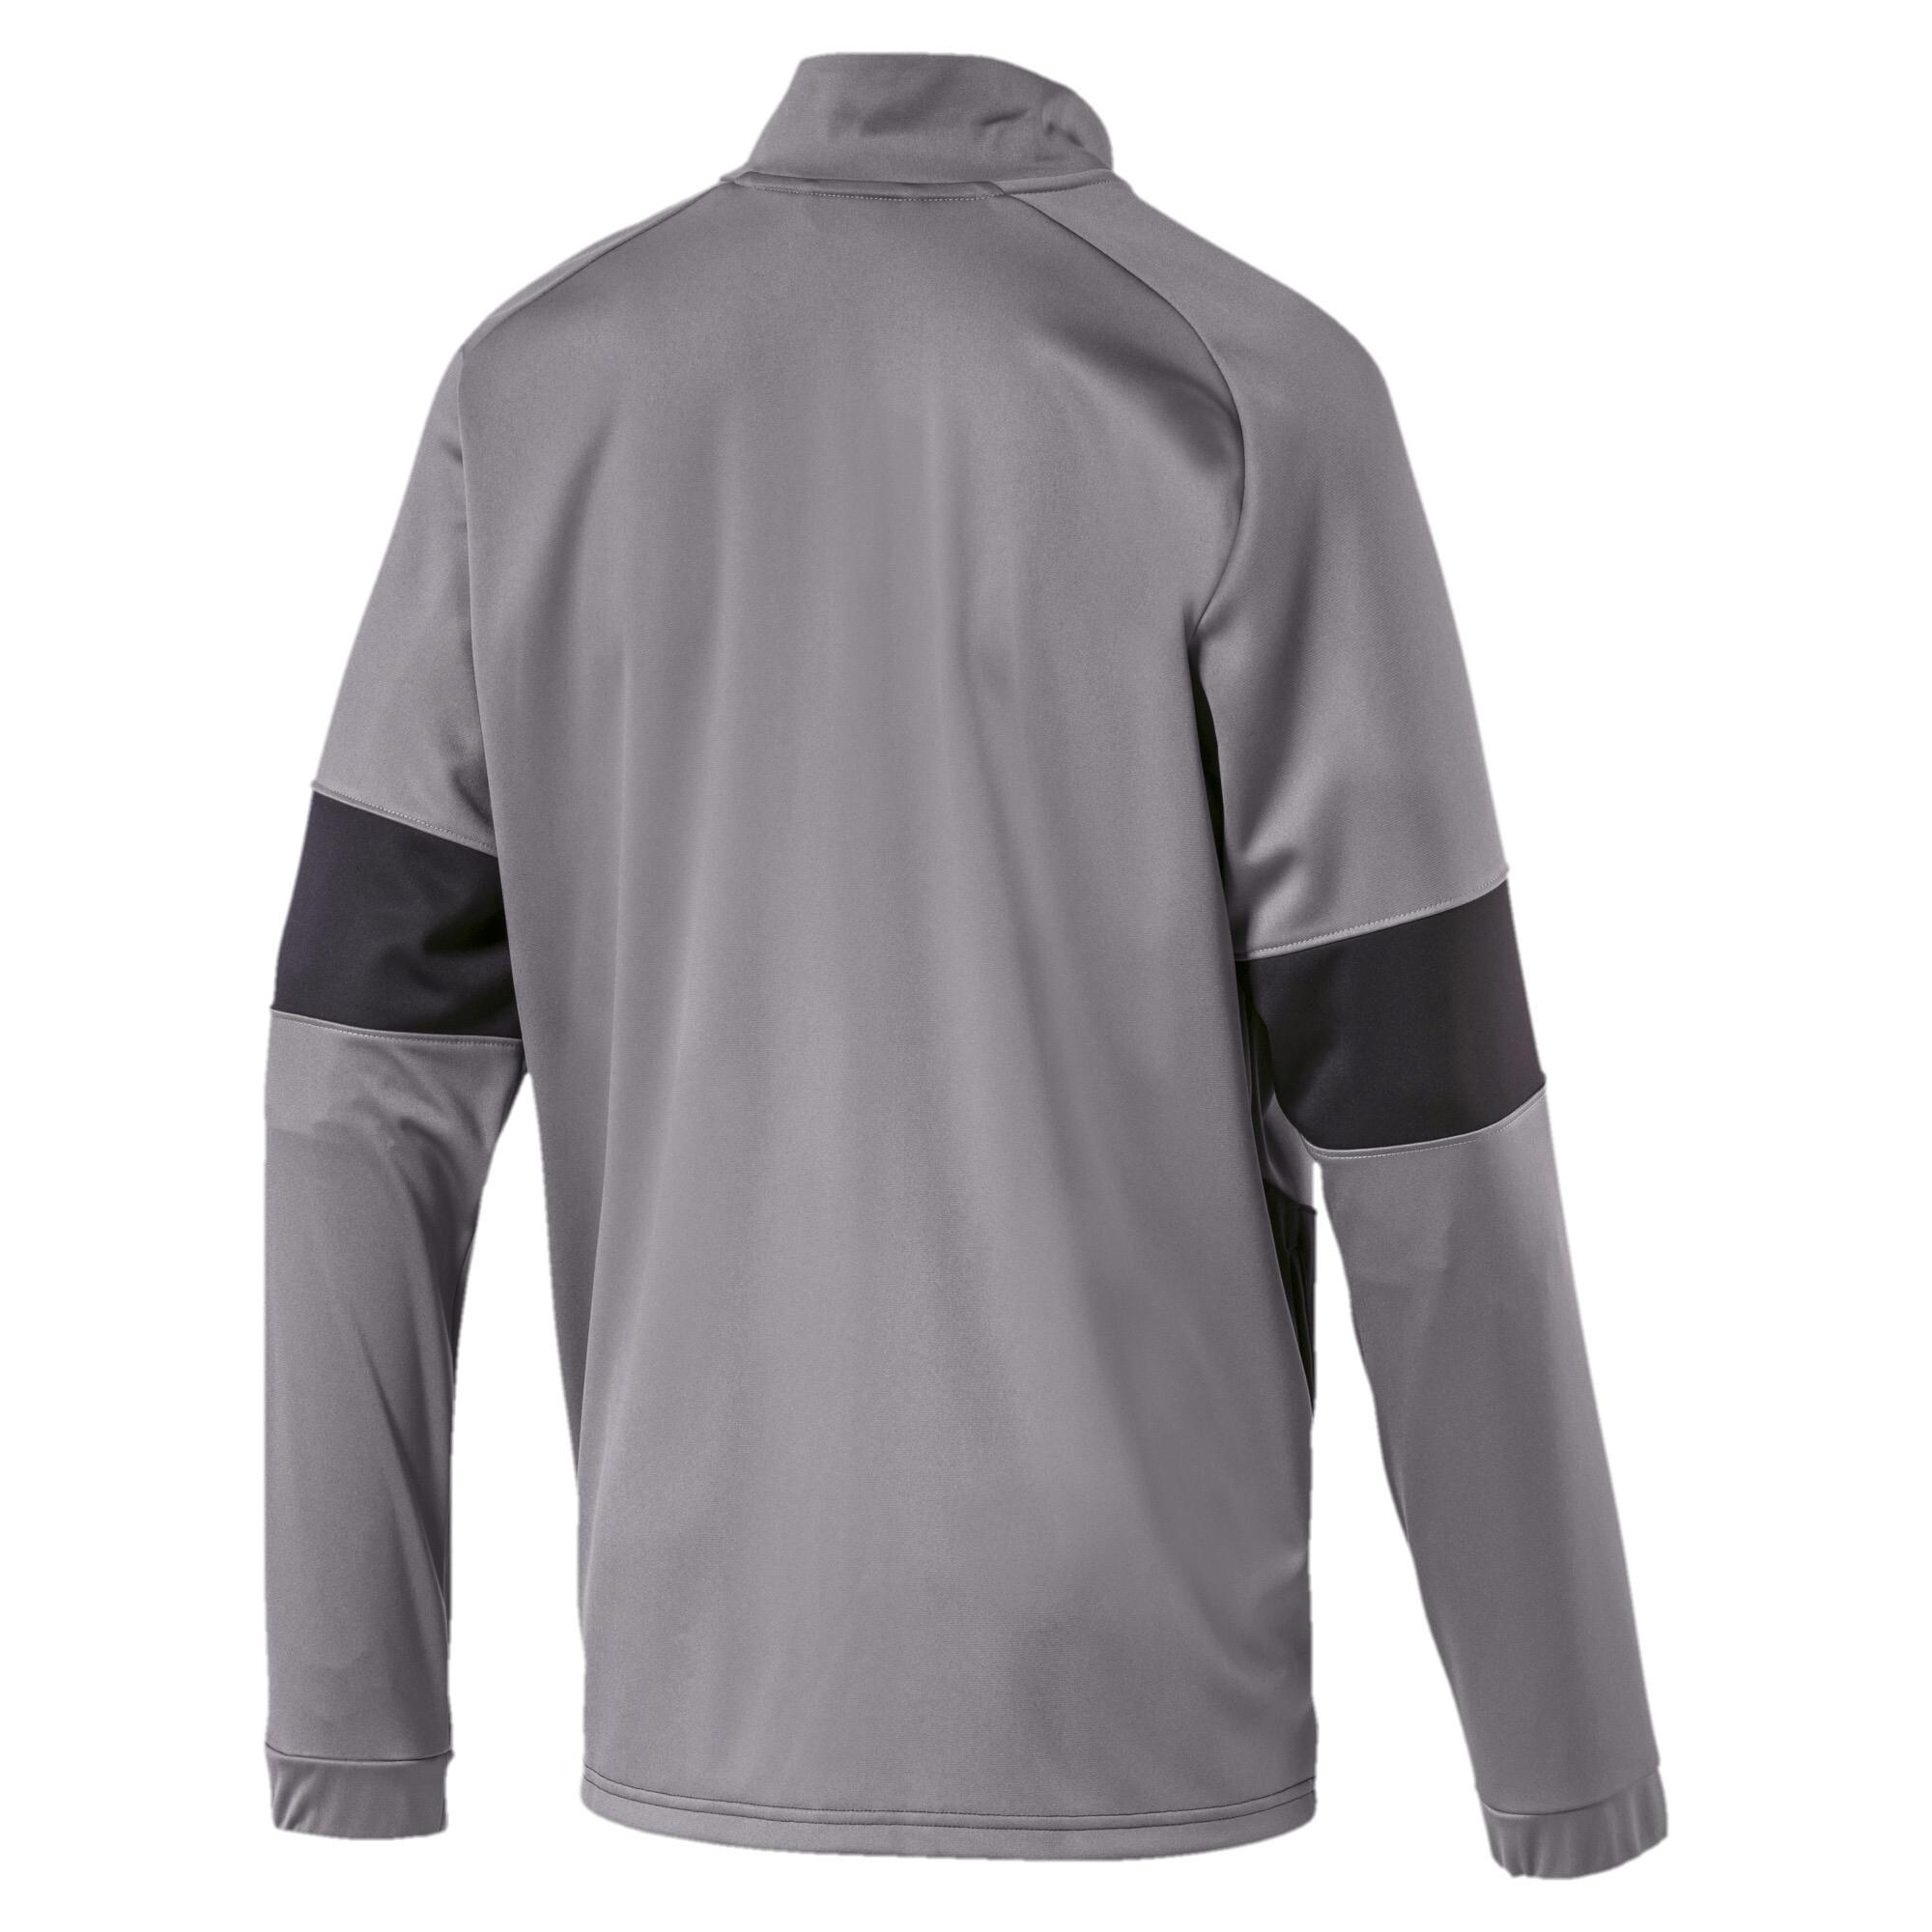 PUMA-PUMA-Blaster-Men-039-s-Jacket-Men-Knitted-Jacket-Training thumbnail 3